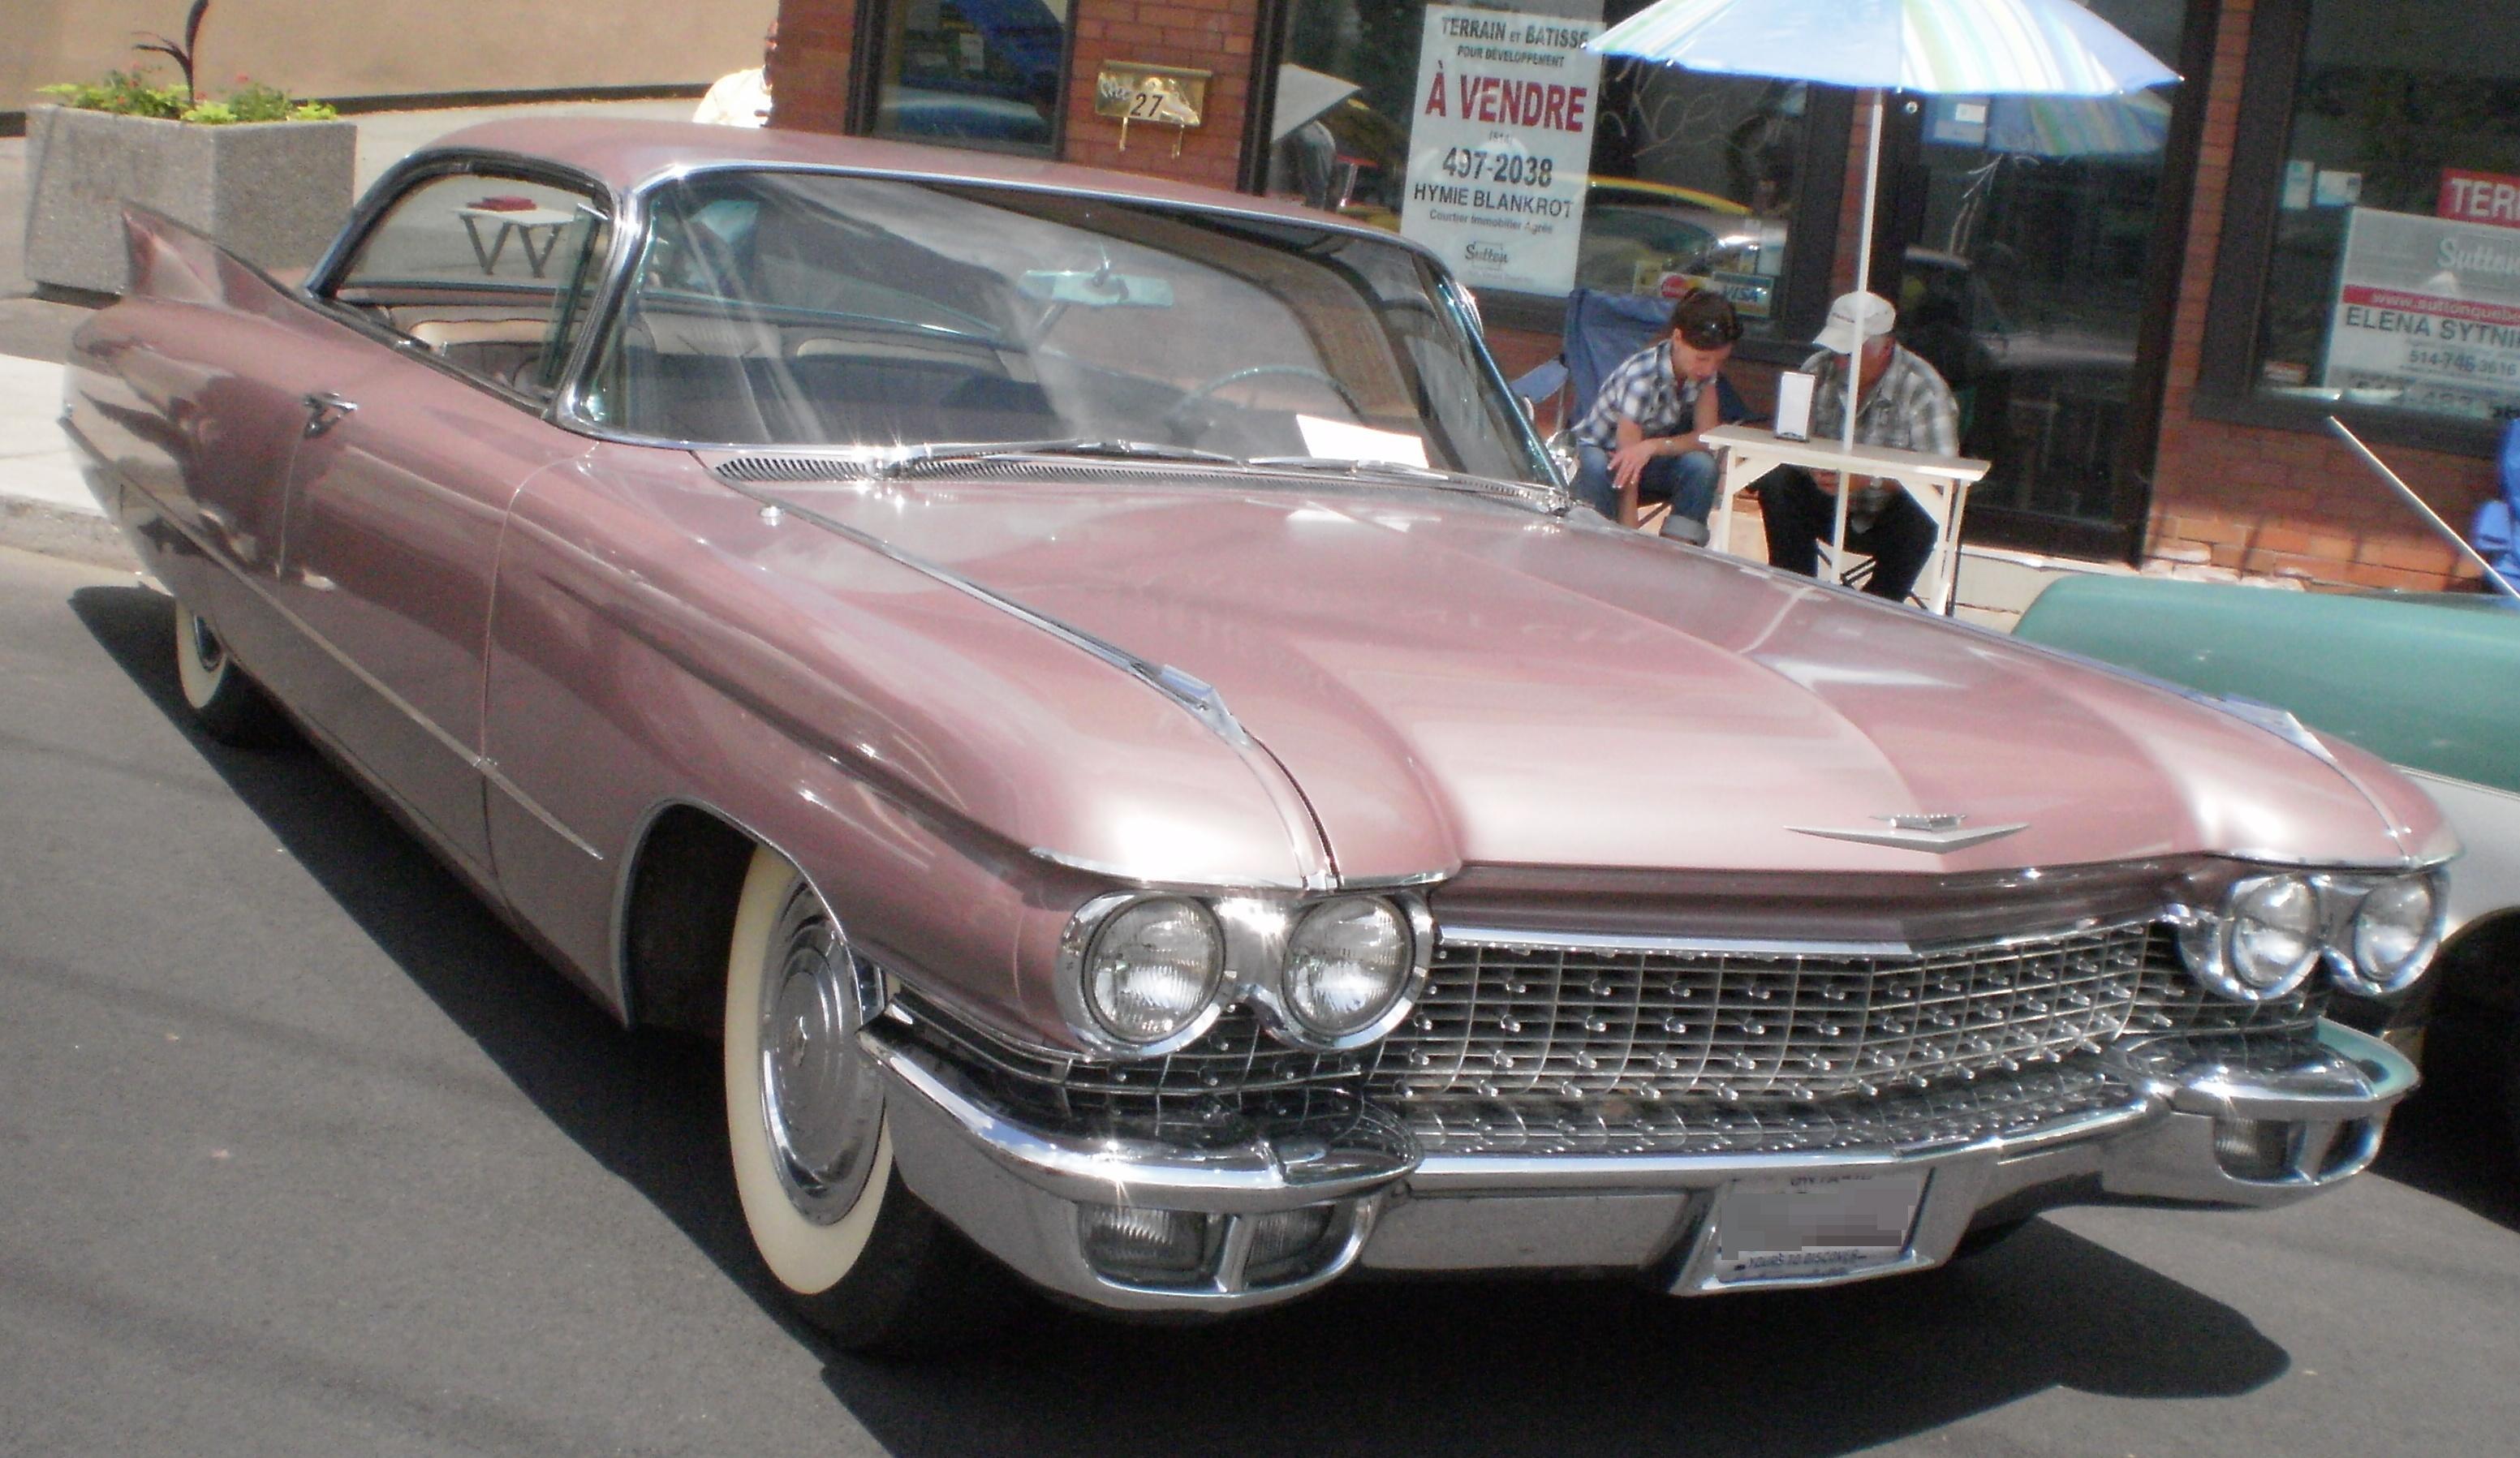 File:'60 Cadillac Coupe De Ville (Cruisin' At The Boardwalk '11).JPG